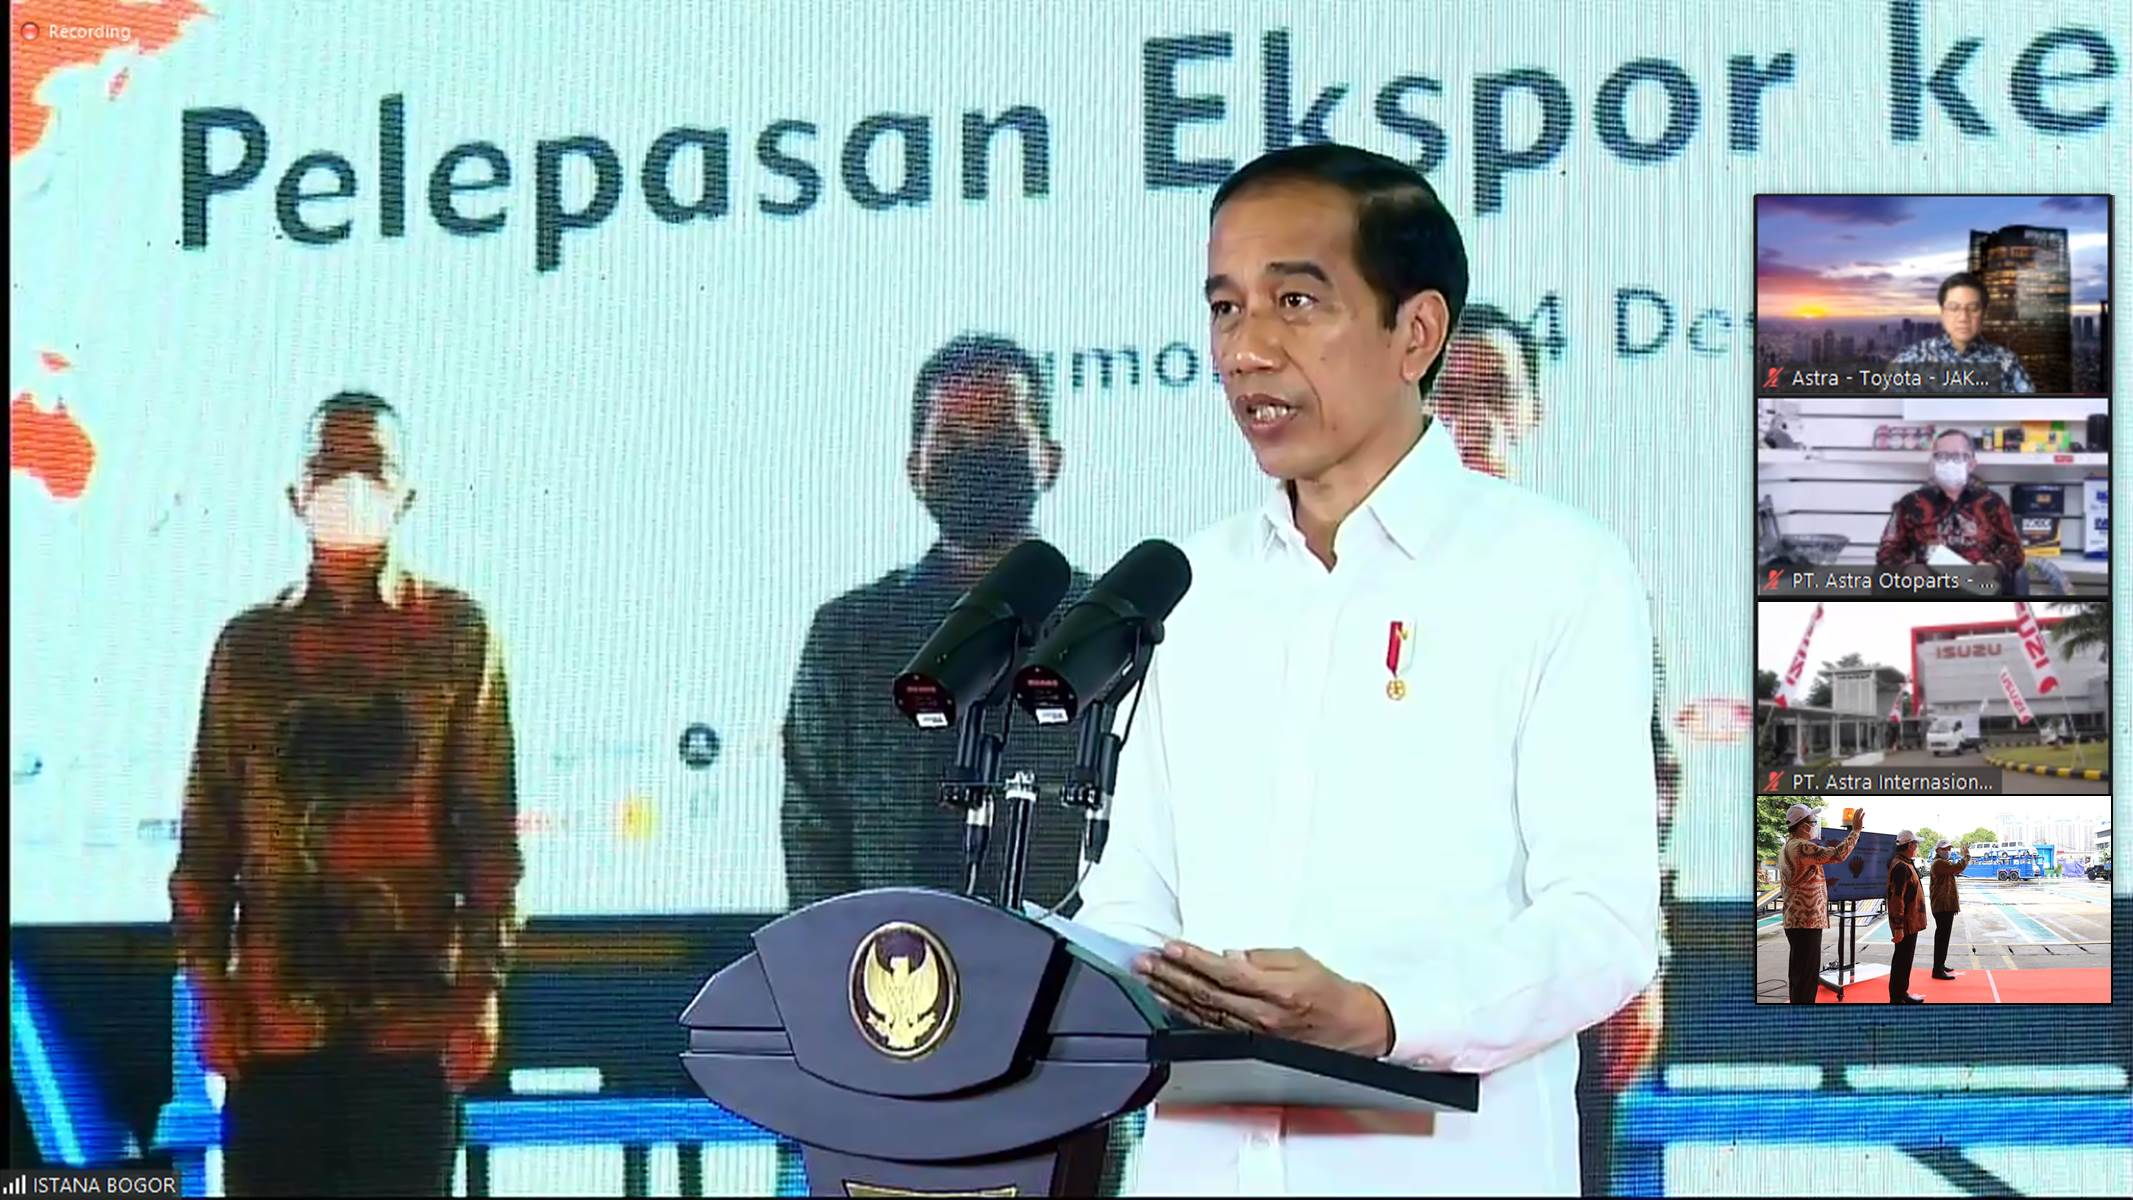 Grup Astra Berpartisipasi Pada Pelepasan Ekspor Dipimpin Presiden Joko Widodo